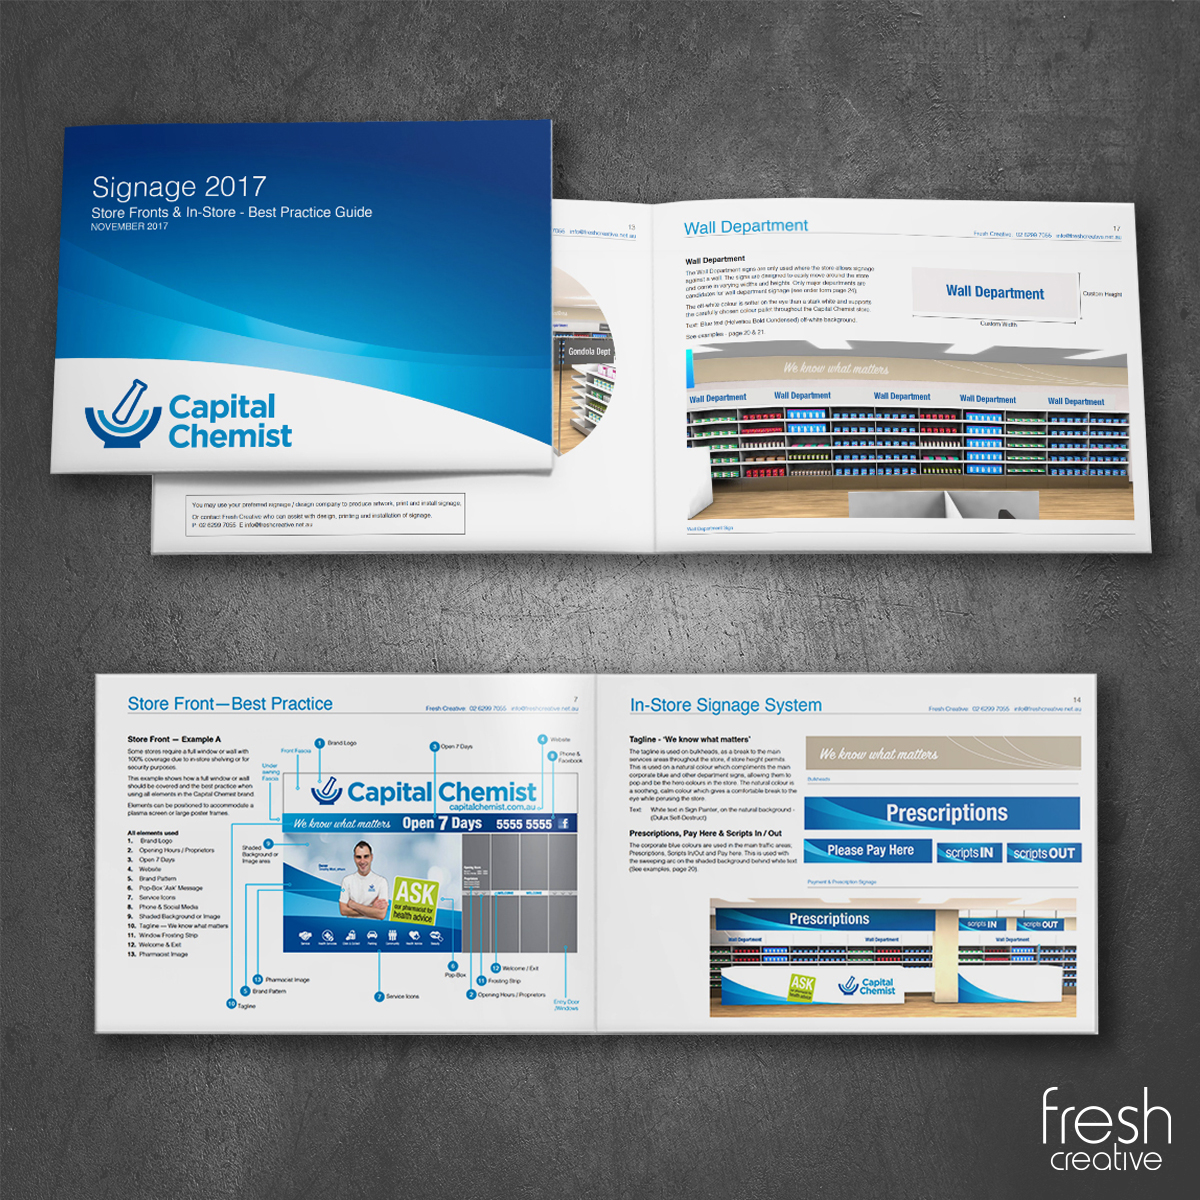 Capital Chemist Custom Guide